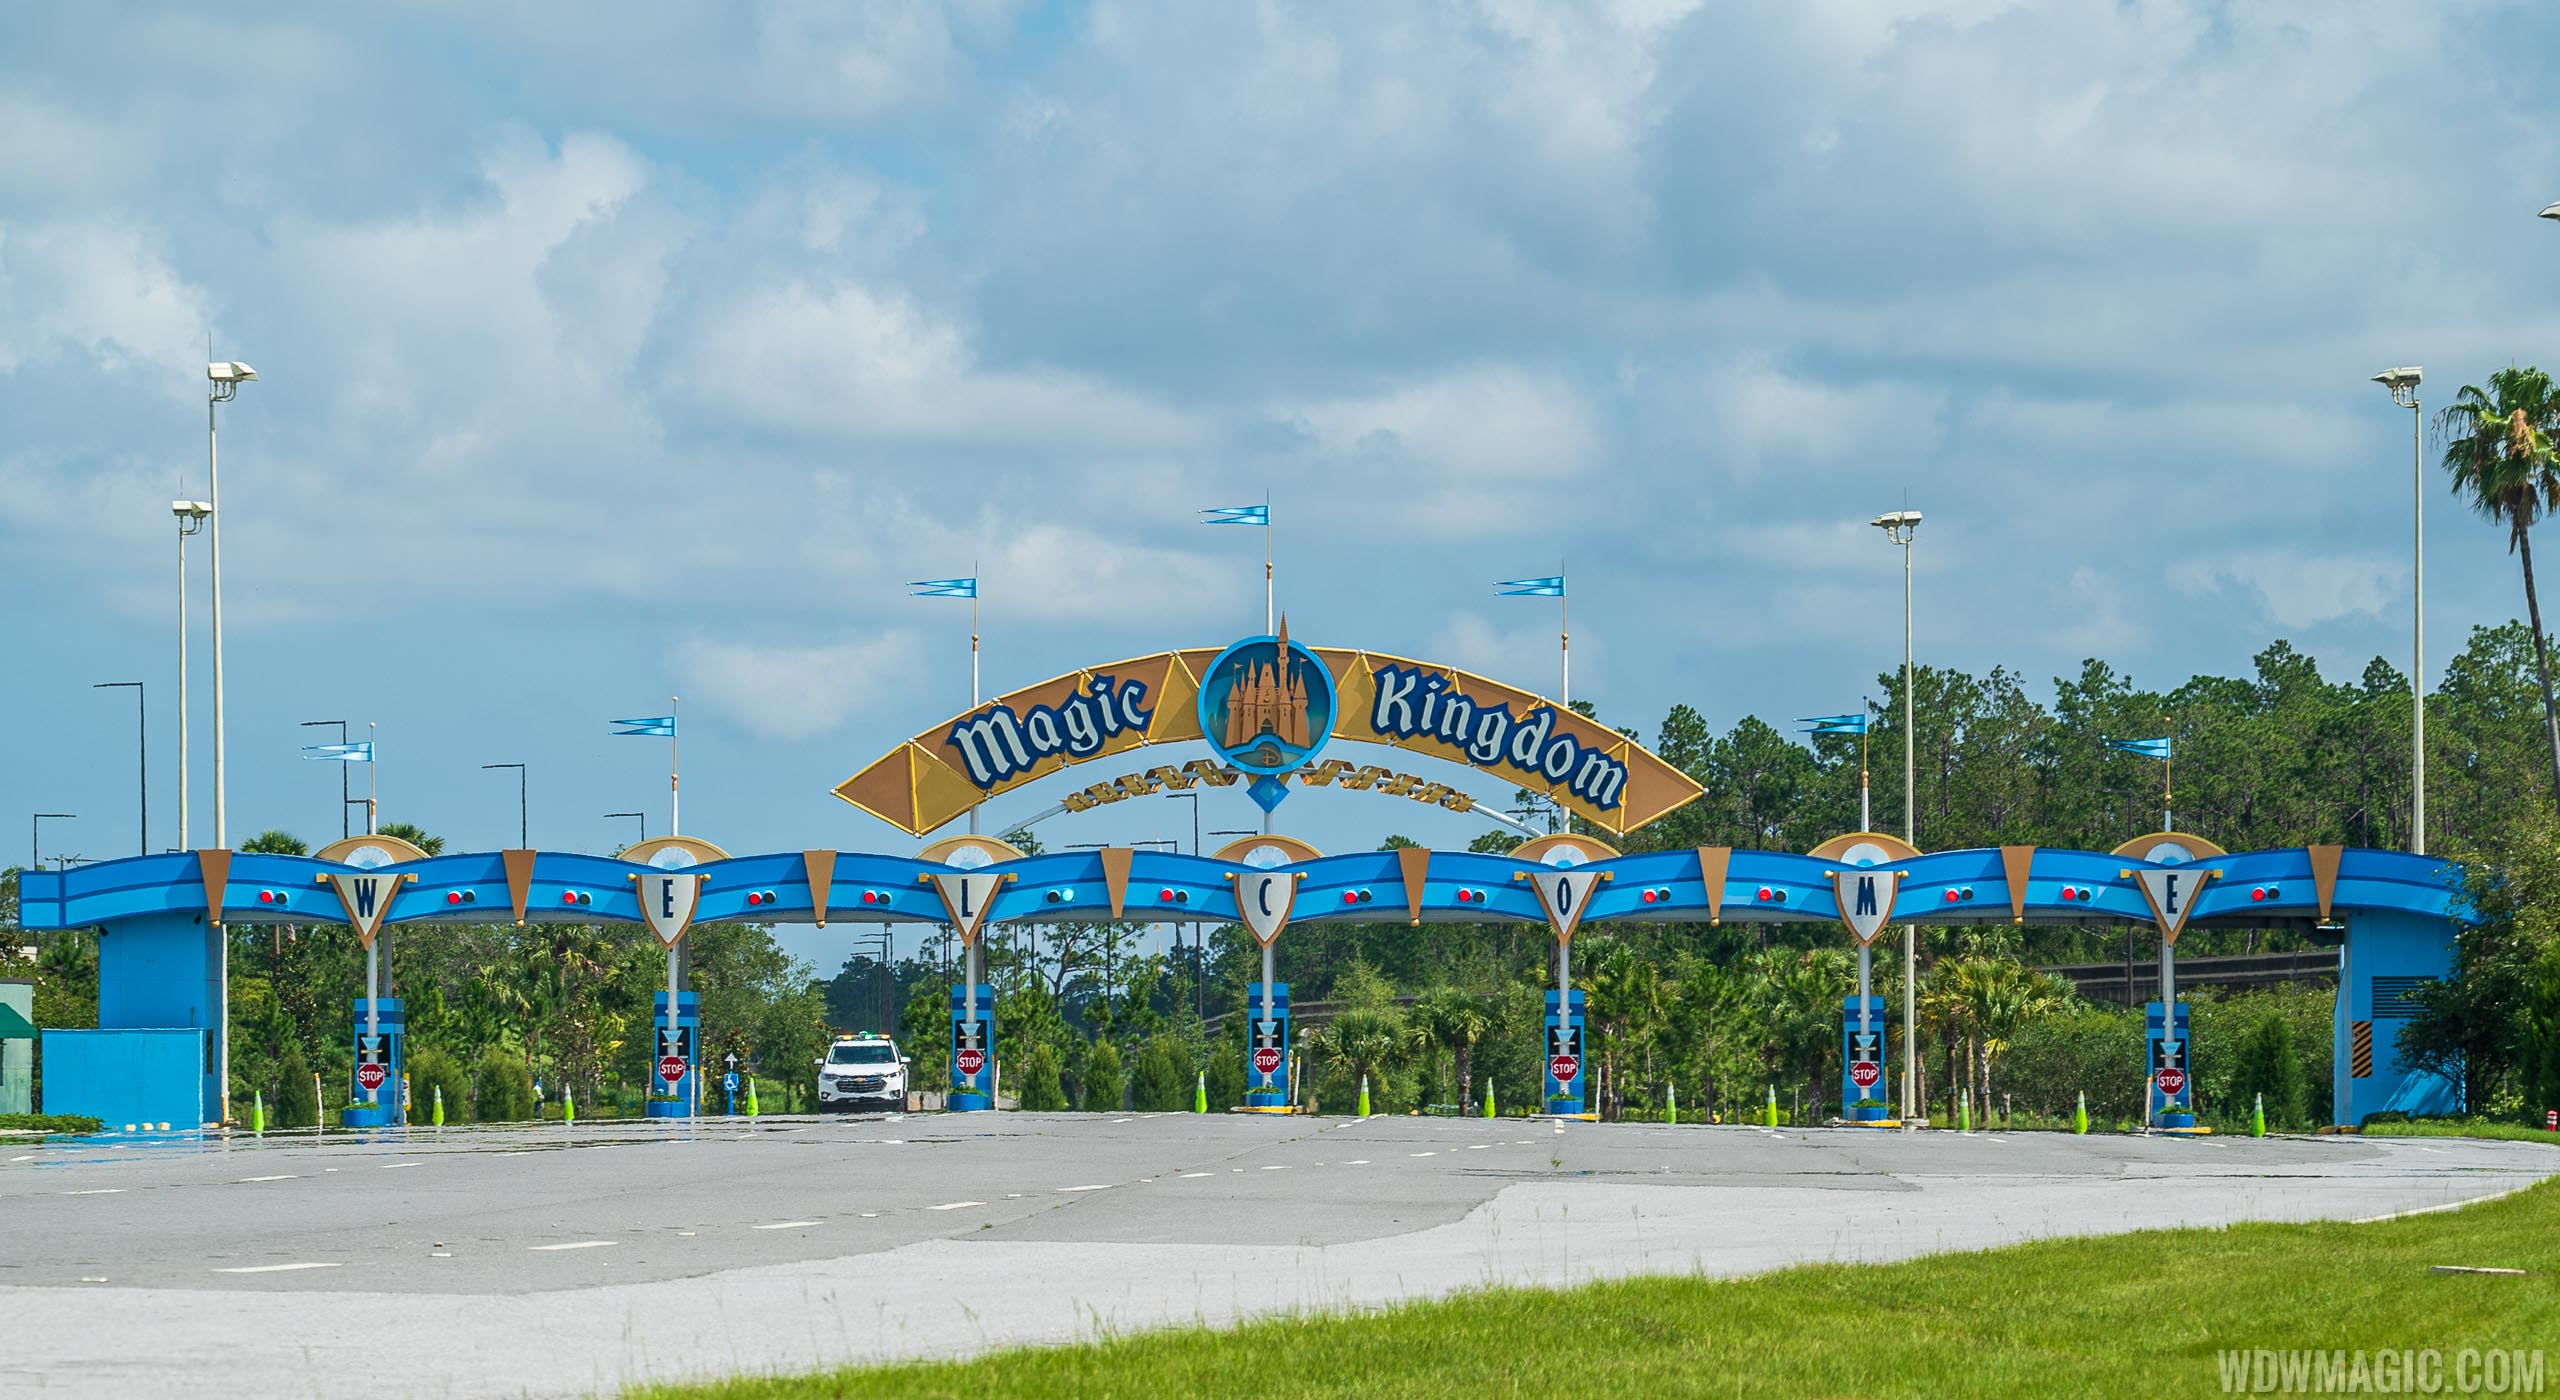 Latest on Walt Disney World COVID-19